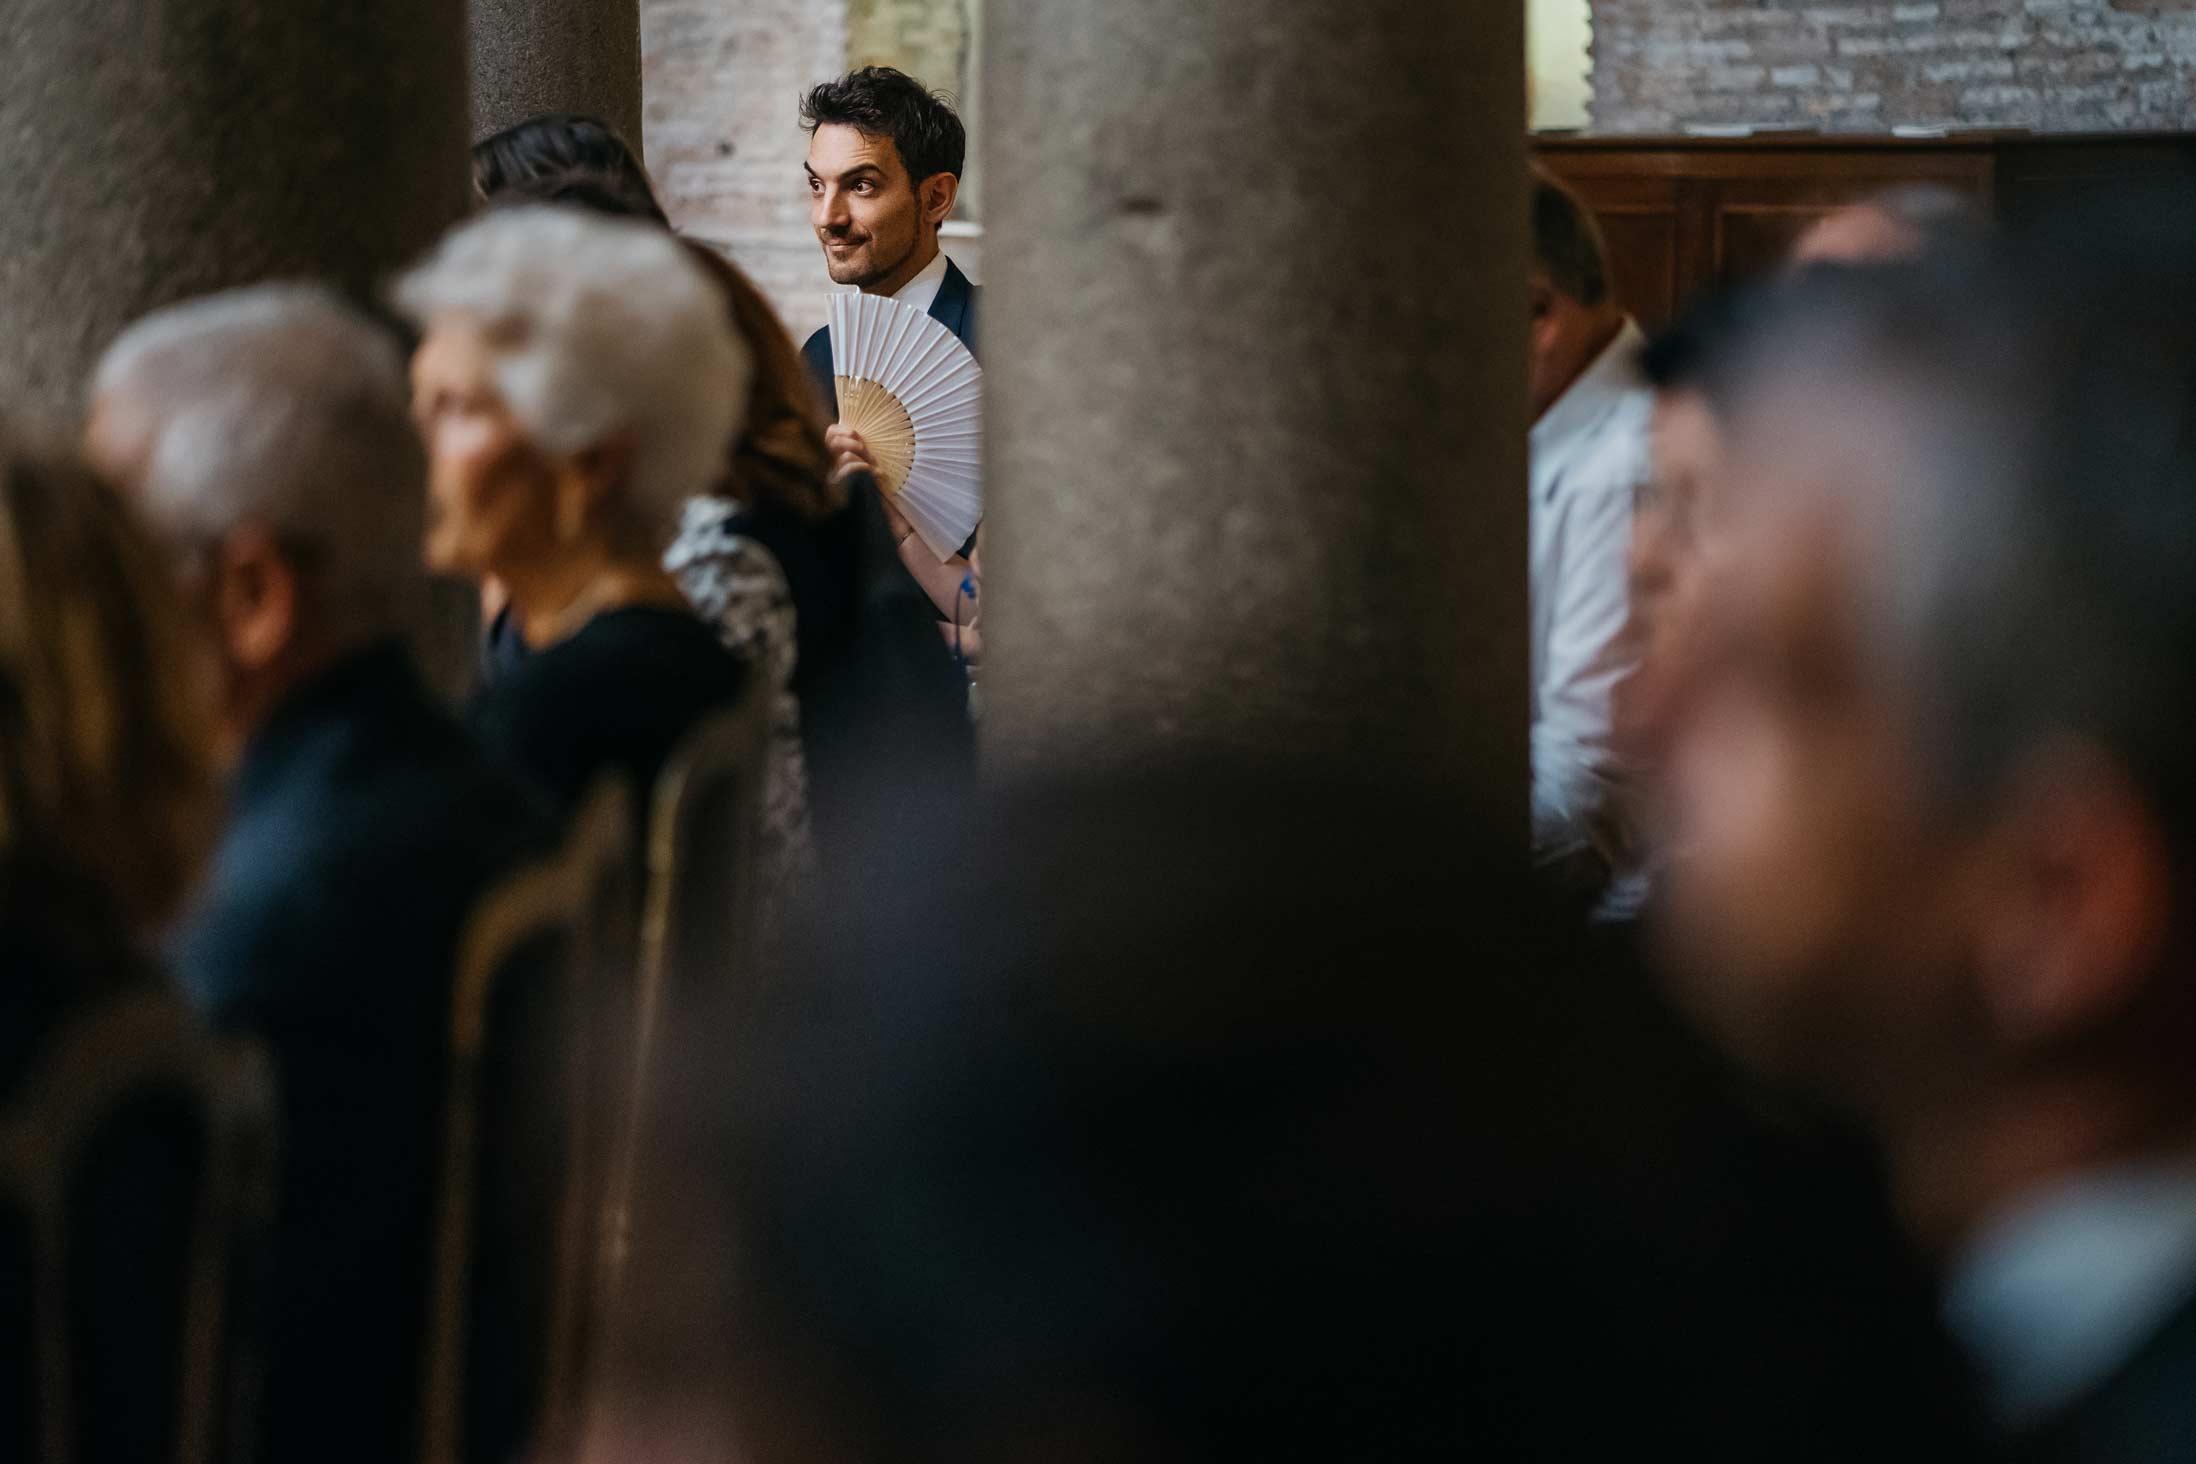 Reportage-Wedding-Photography-Italy-Ceremony